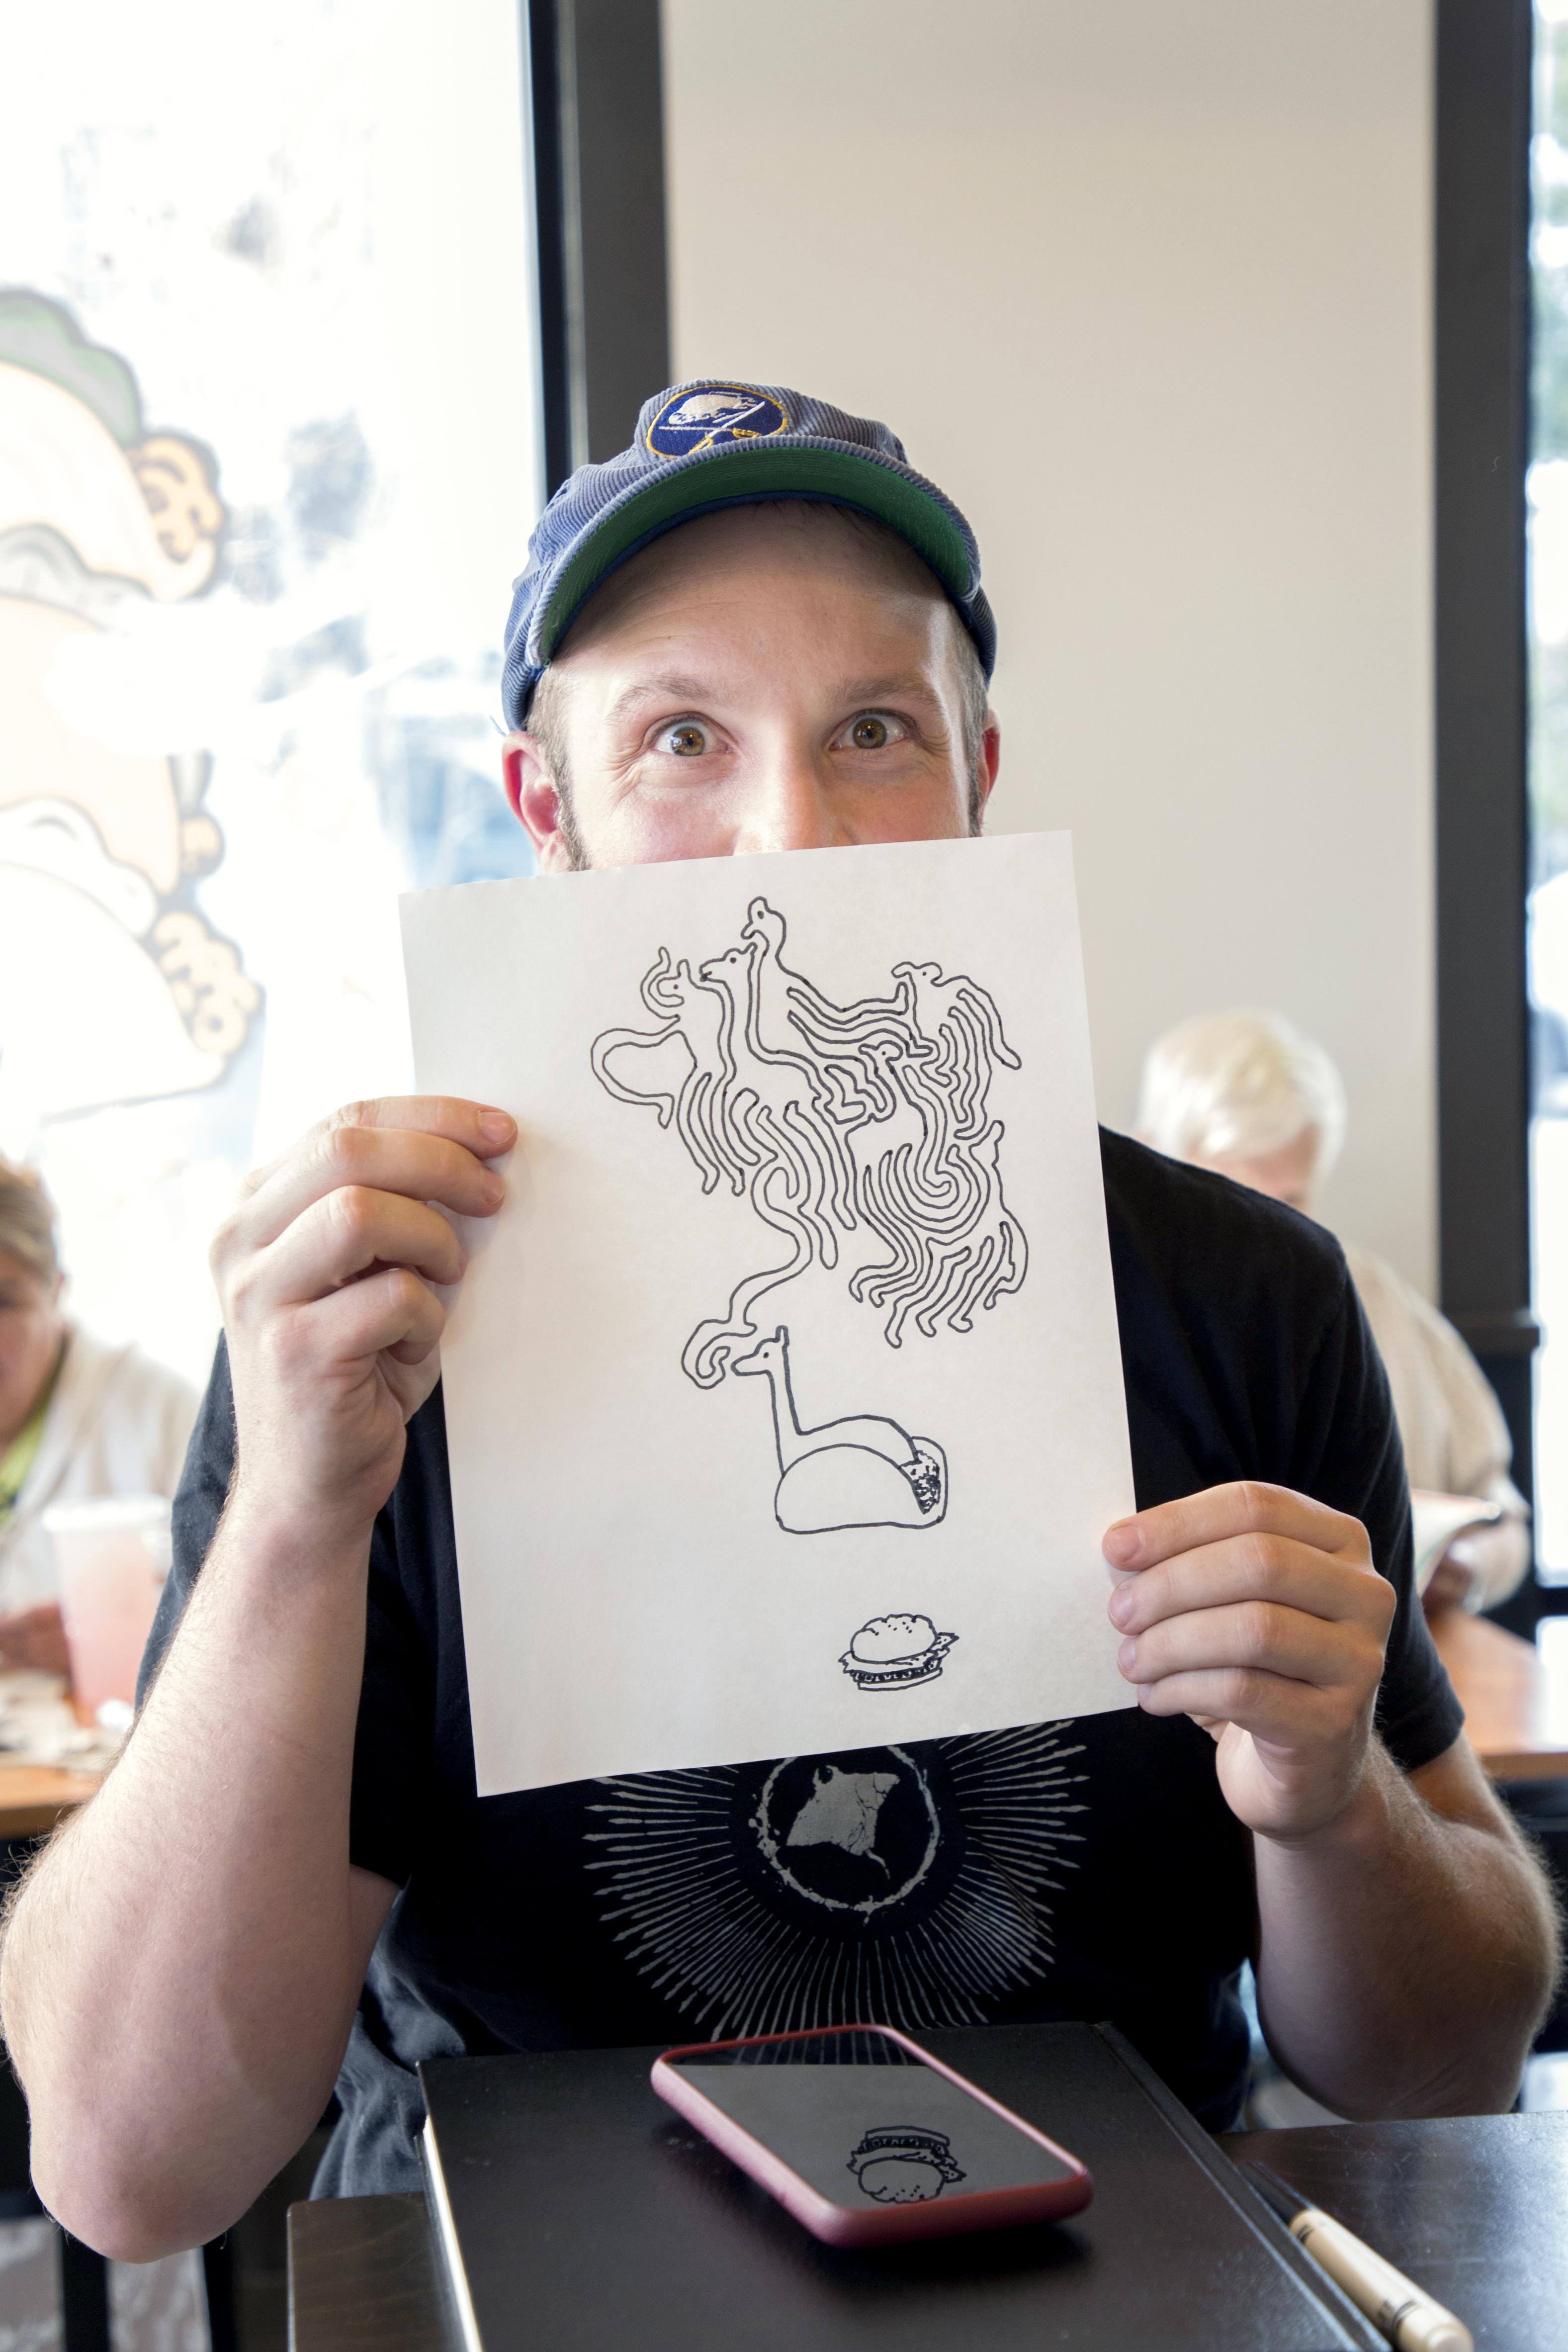 Taco bell drawing club, copyright Diana Koenigsberg